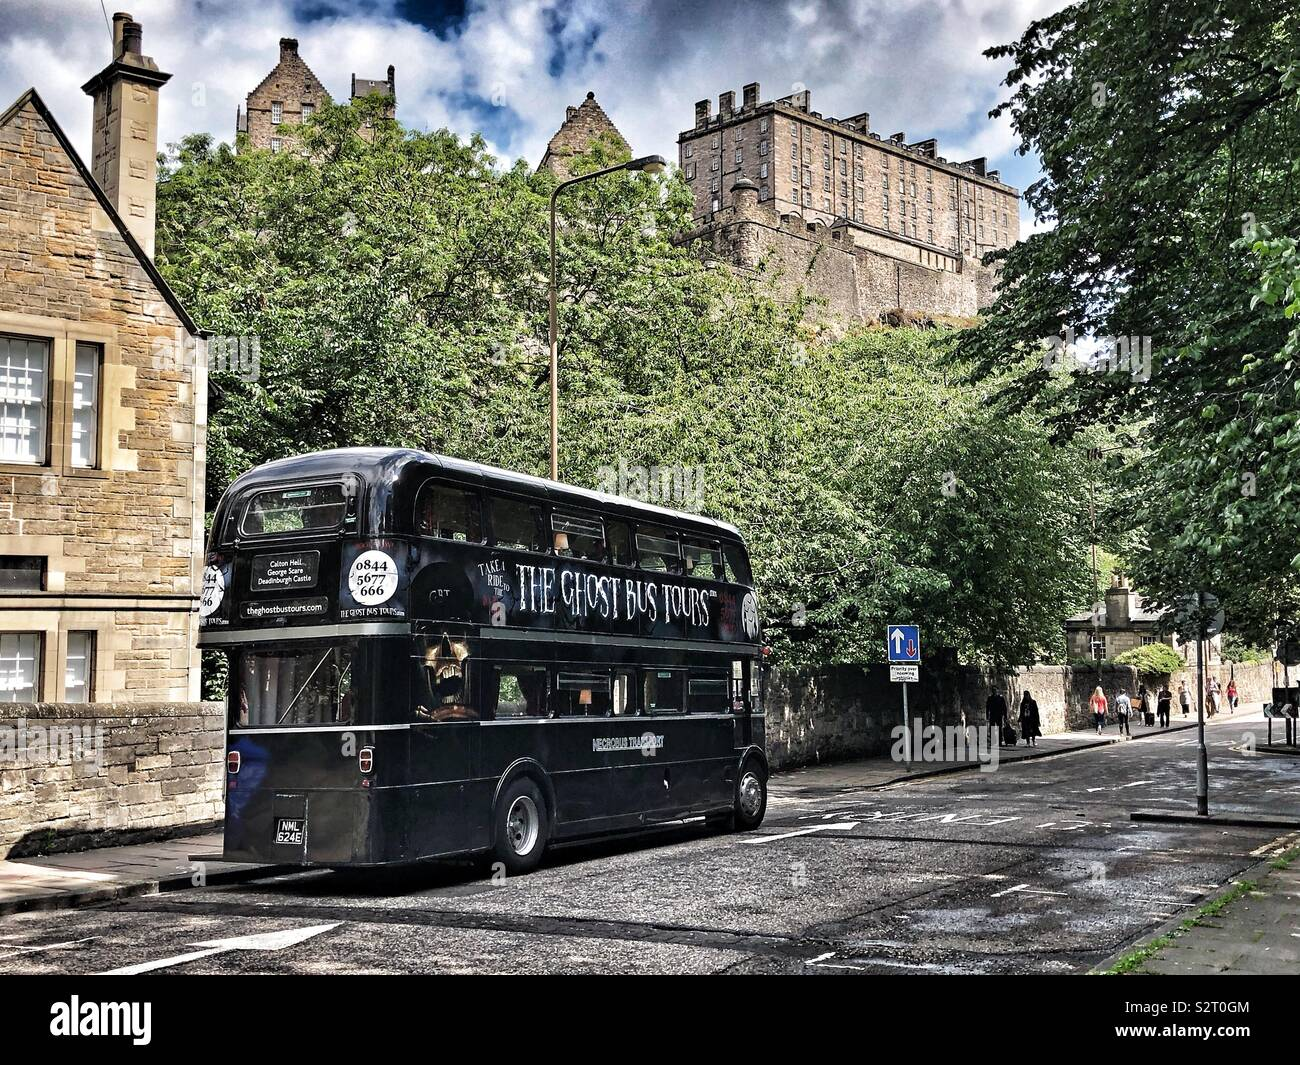 Ghost bus tours and Edinburgh Castle Stock Photo